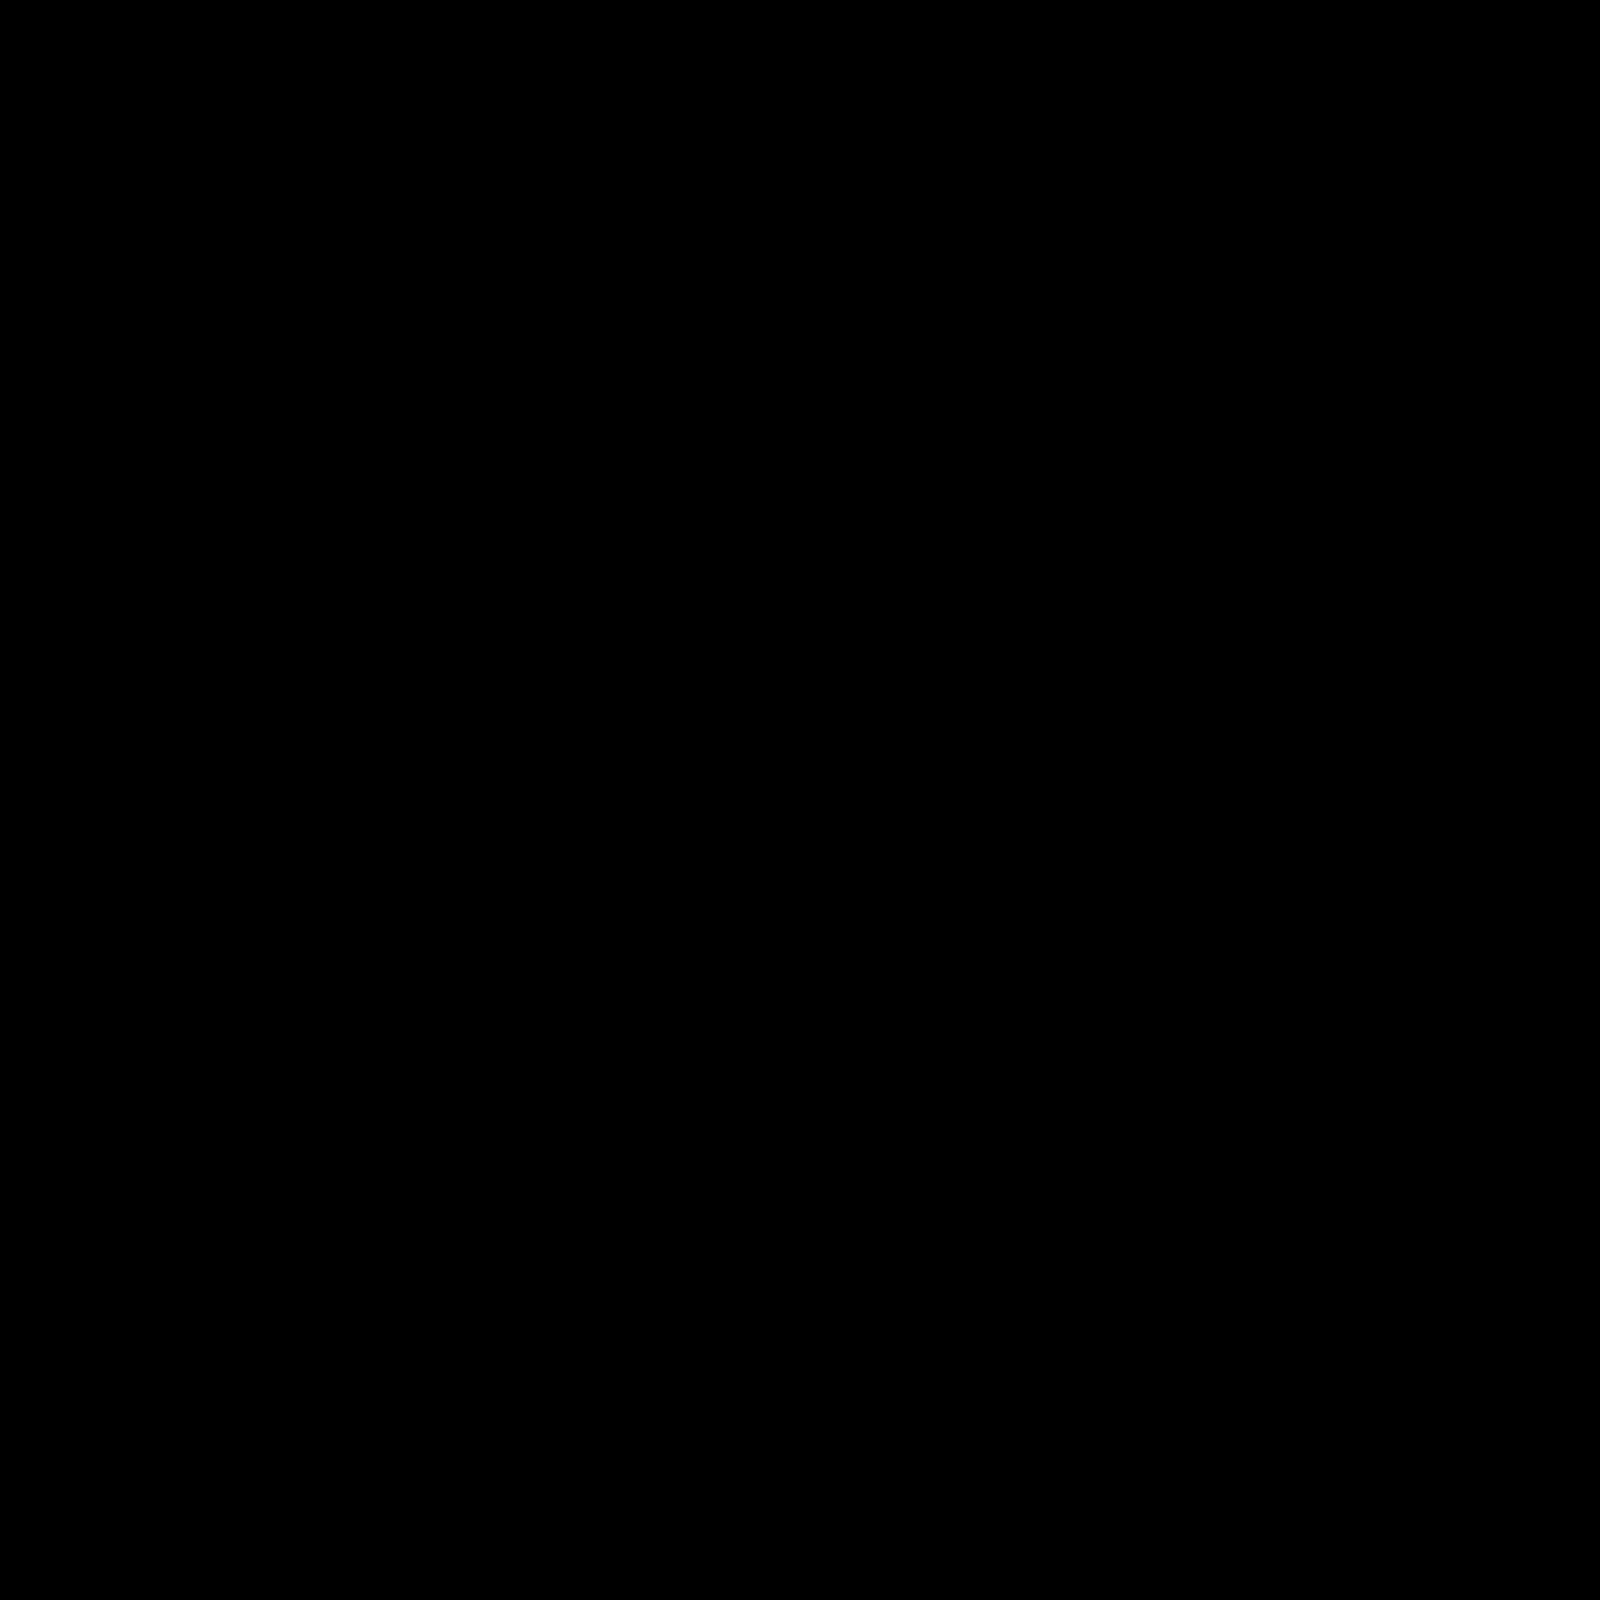 Database Export icon